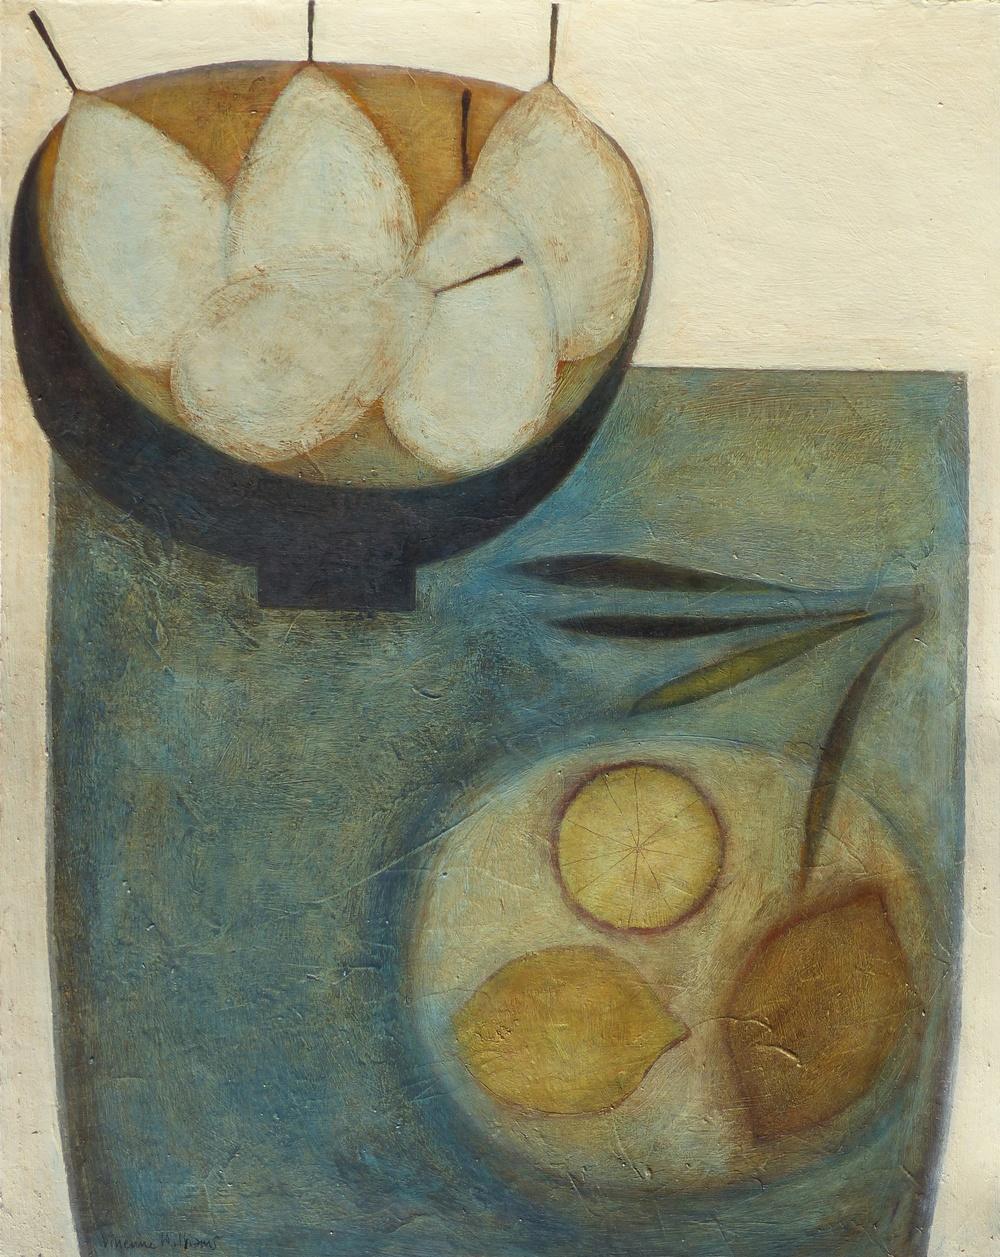 Five Pale Pears, Lemons and Beans, 51cm x 41cm, 2014